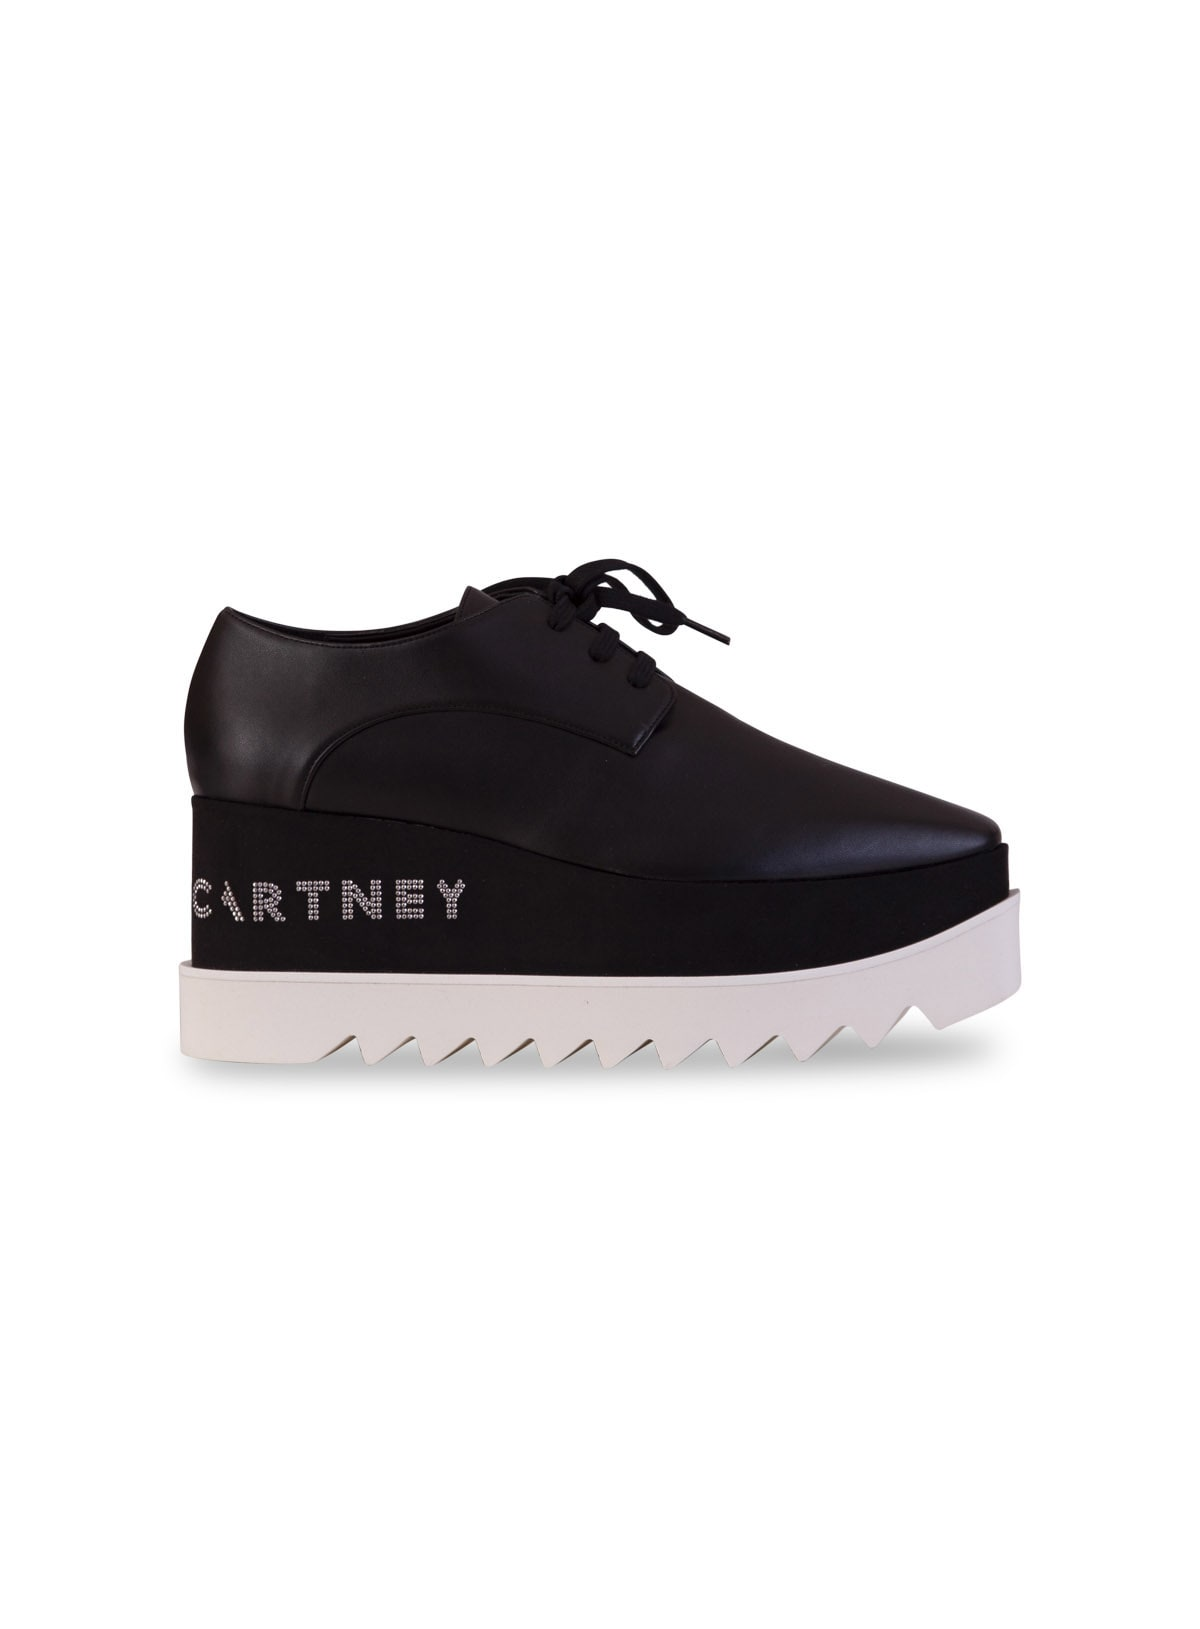 Stella McCartney Logo Platform Derby Shoes